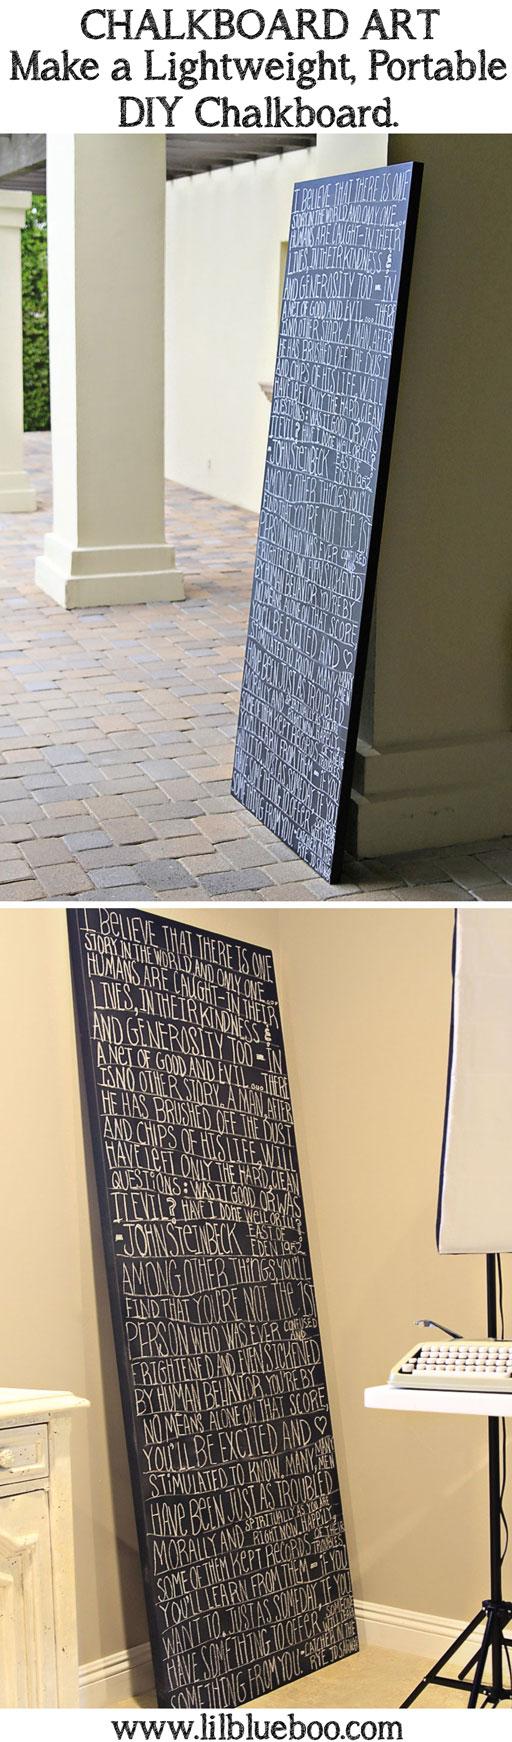 Chalkboard Art: Make a Large Lightweight Portable Chalkboard via lilblueboo.com #diy #tutorial #chalkboard